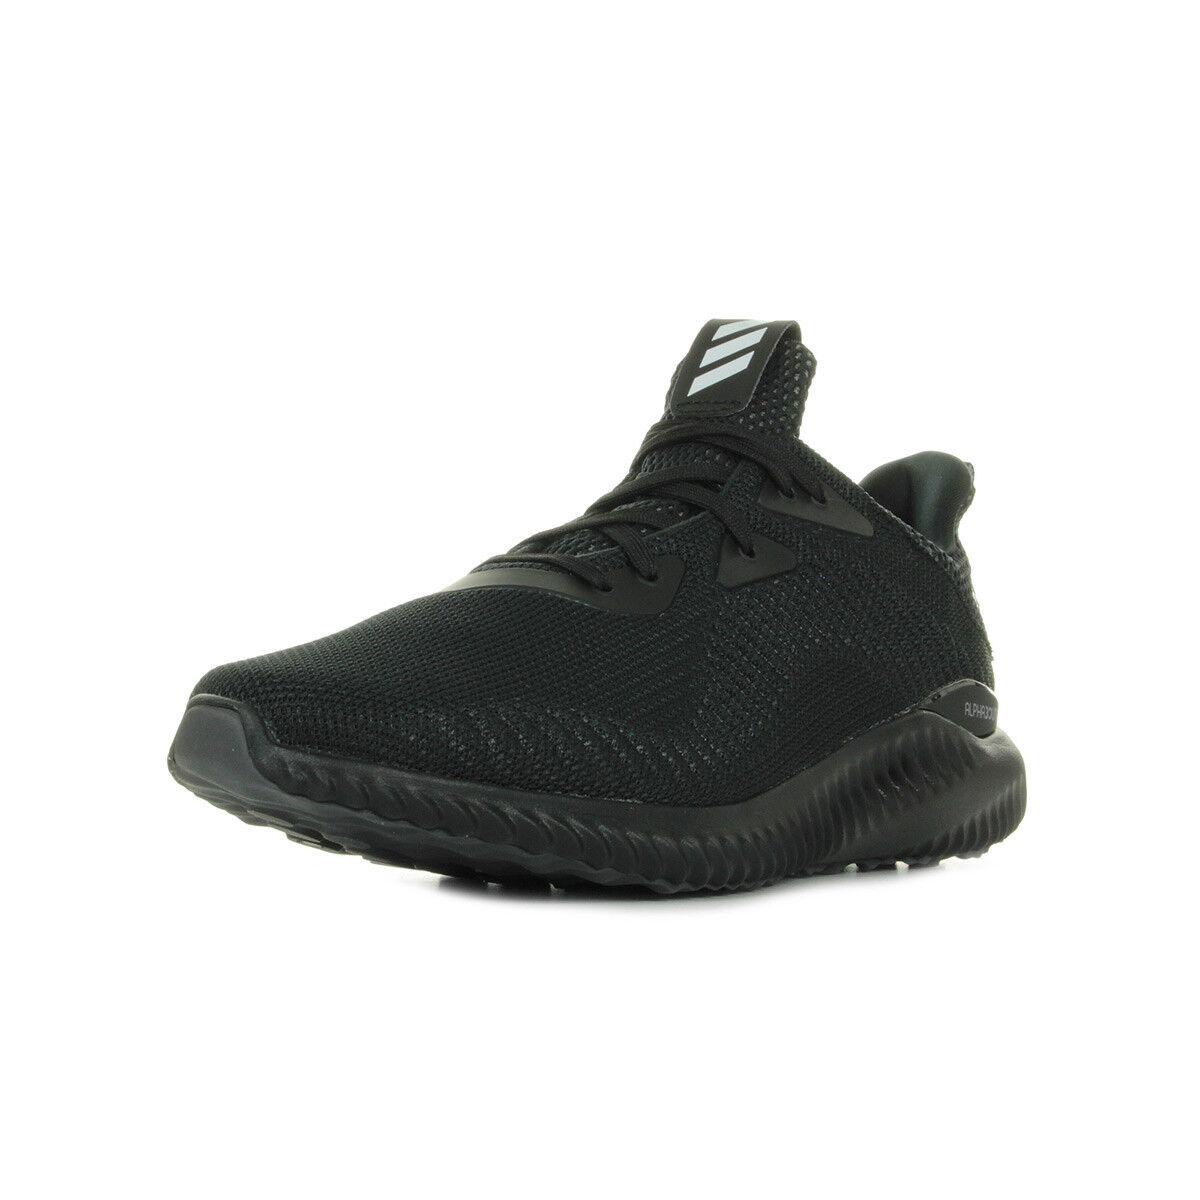 Zapatos Noir Baskets adidas homme Alphabounce 1 M taille Noir Zapatos Noire Synthétique 0ba3fb